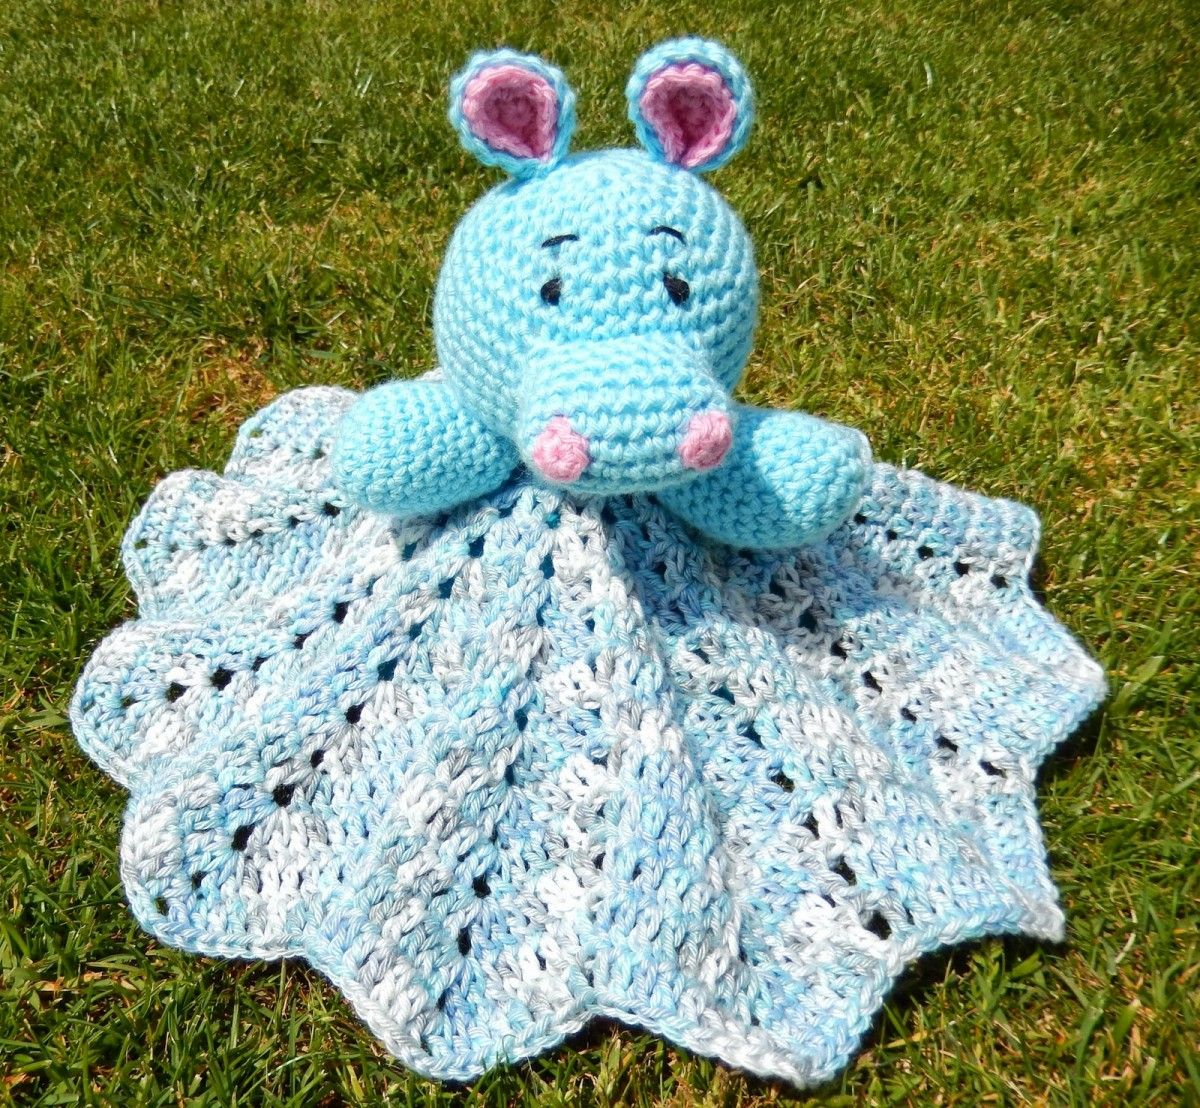 Crochet Hippo Pattern Ideas Best Collection | Pinterest ...